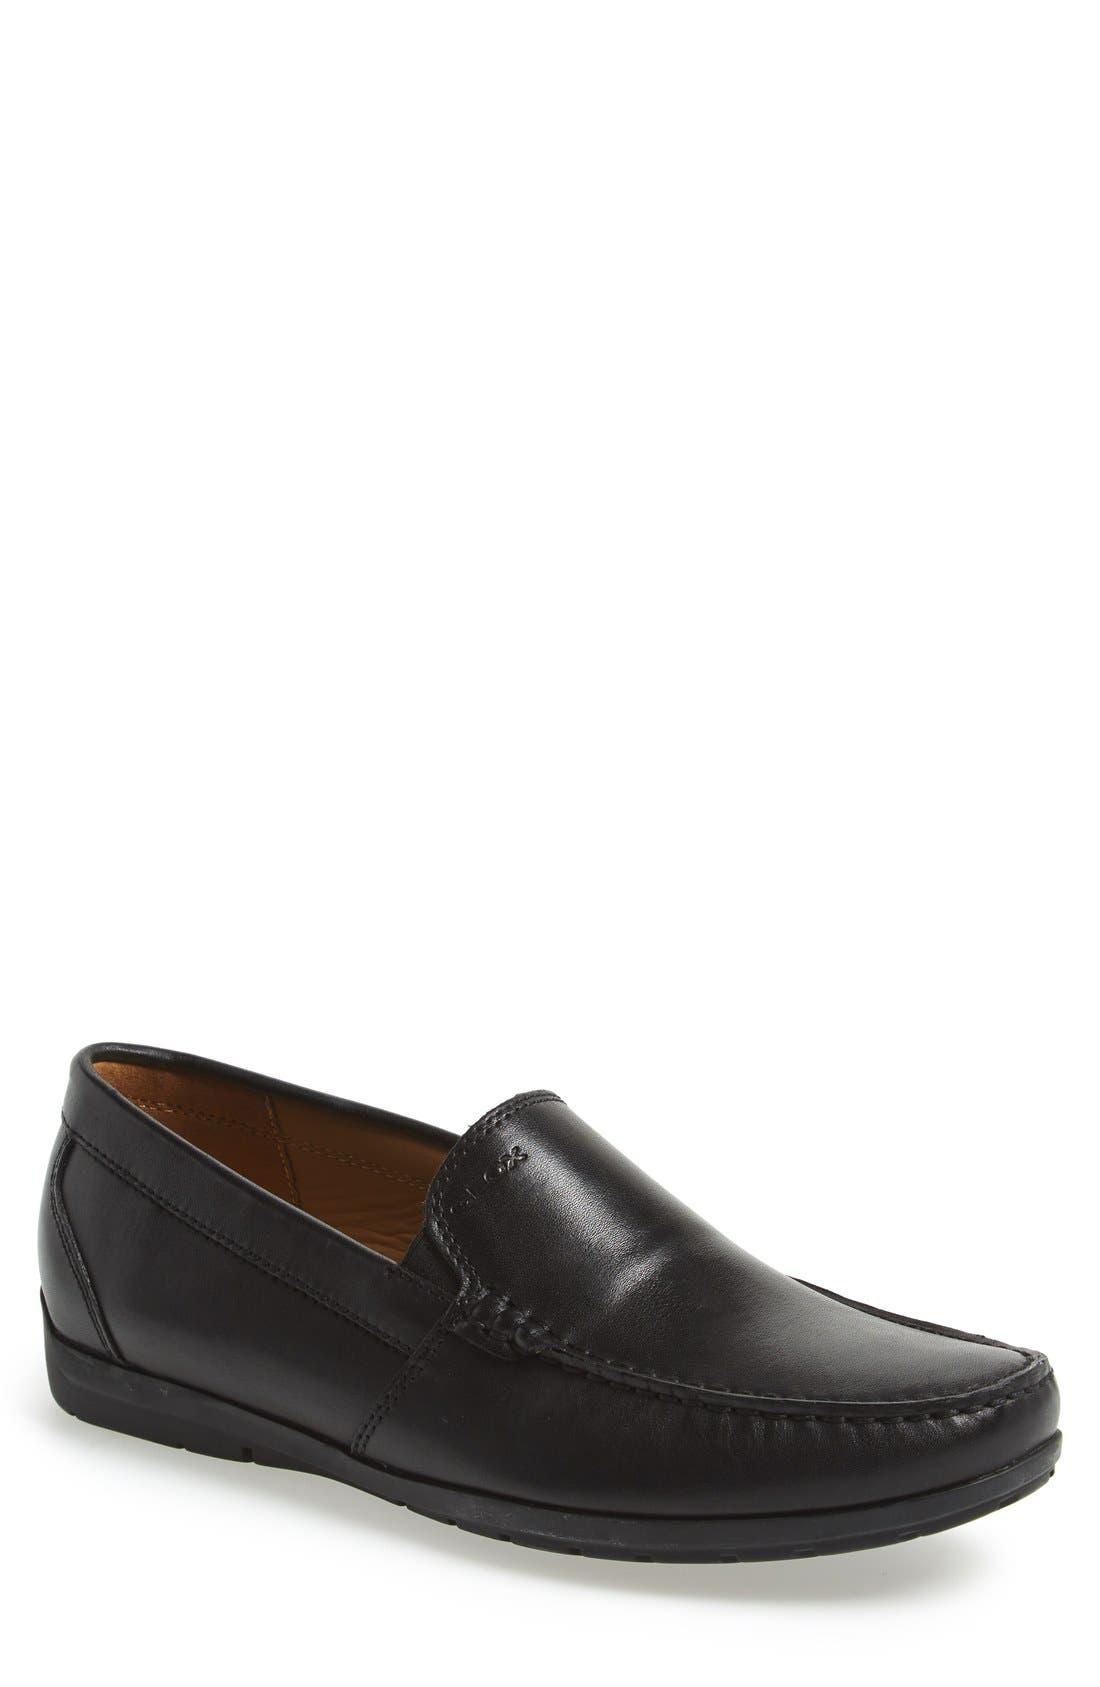 'Simon W2' Venetian Loafer,                         Main,                         color, BLACK